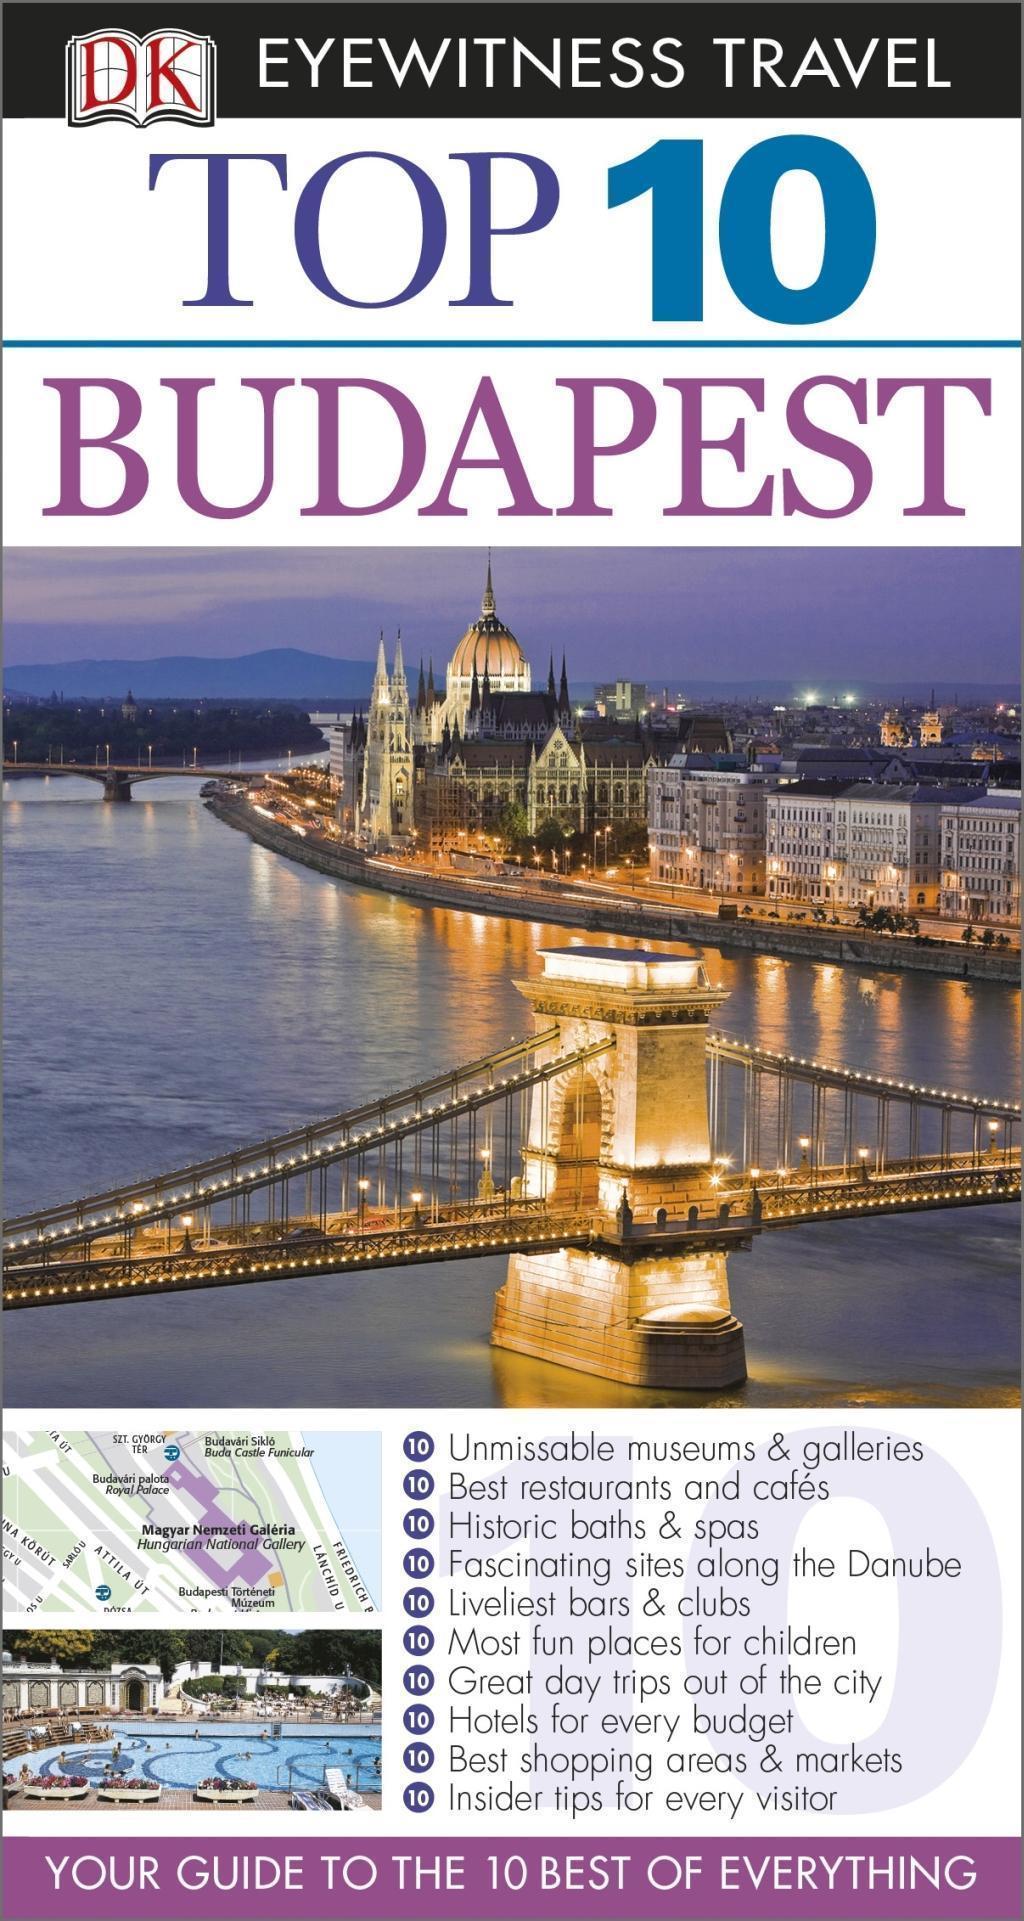 DK Eyewitness Top 10 Travel Guide: Budapest